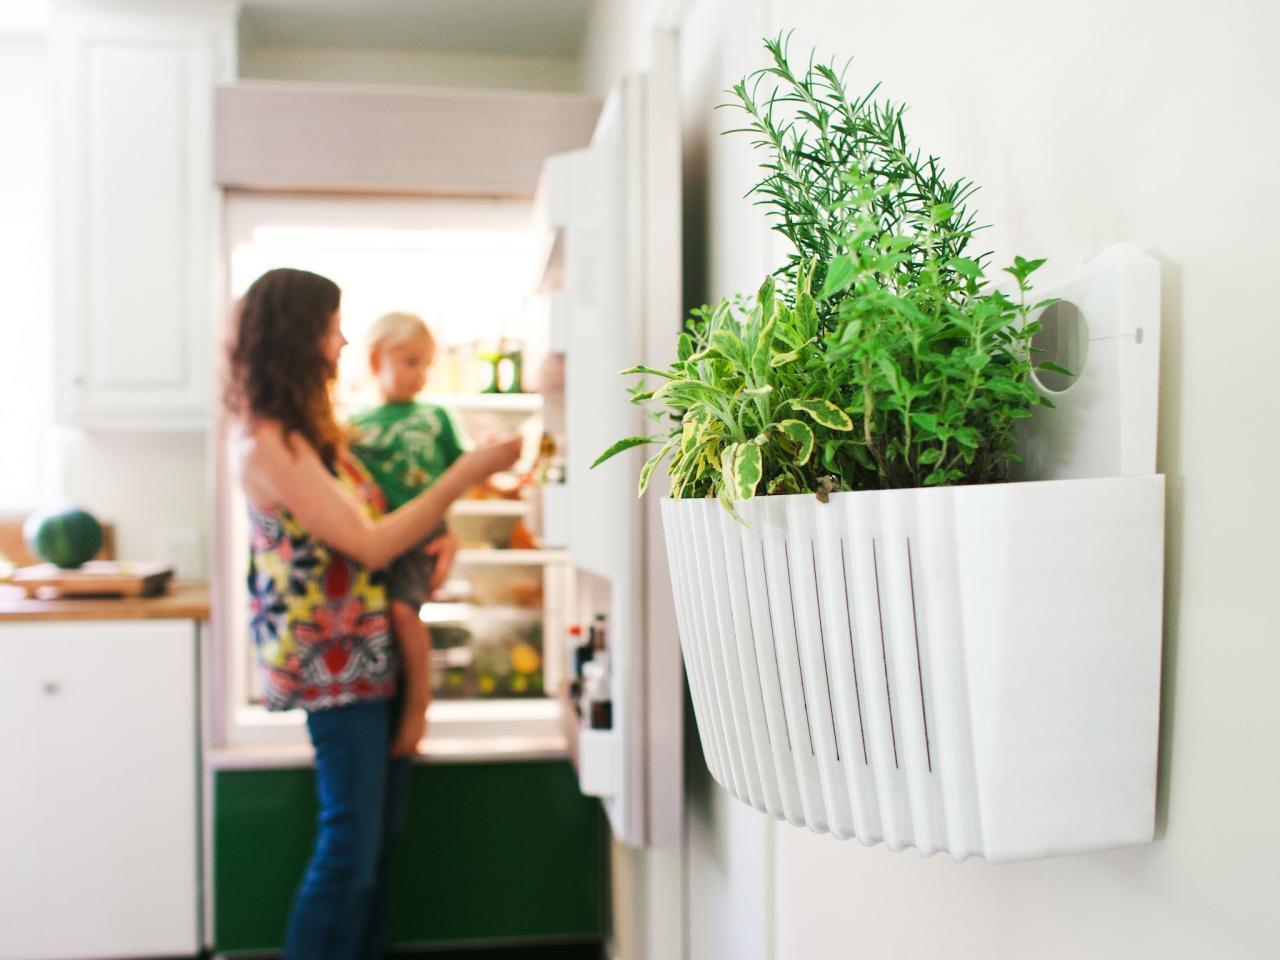 Living Walls Bring Container Gardening Indoors | HGTV